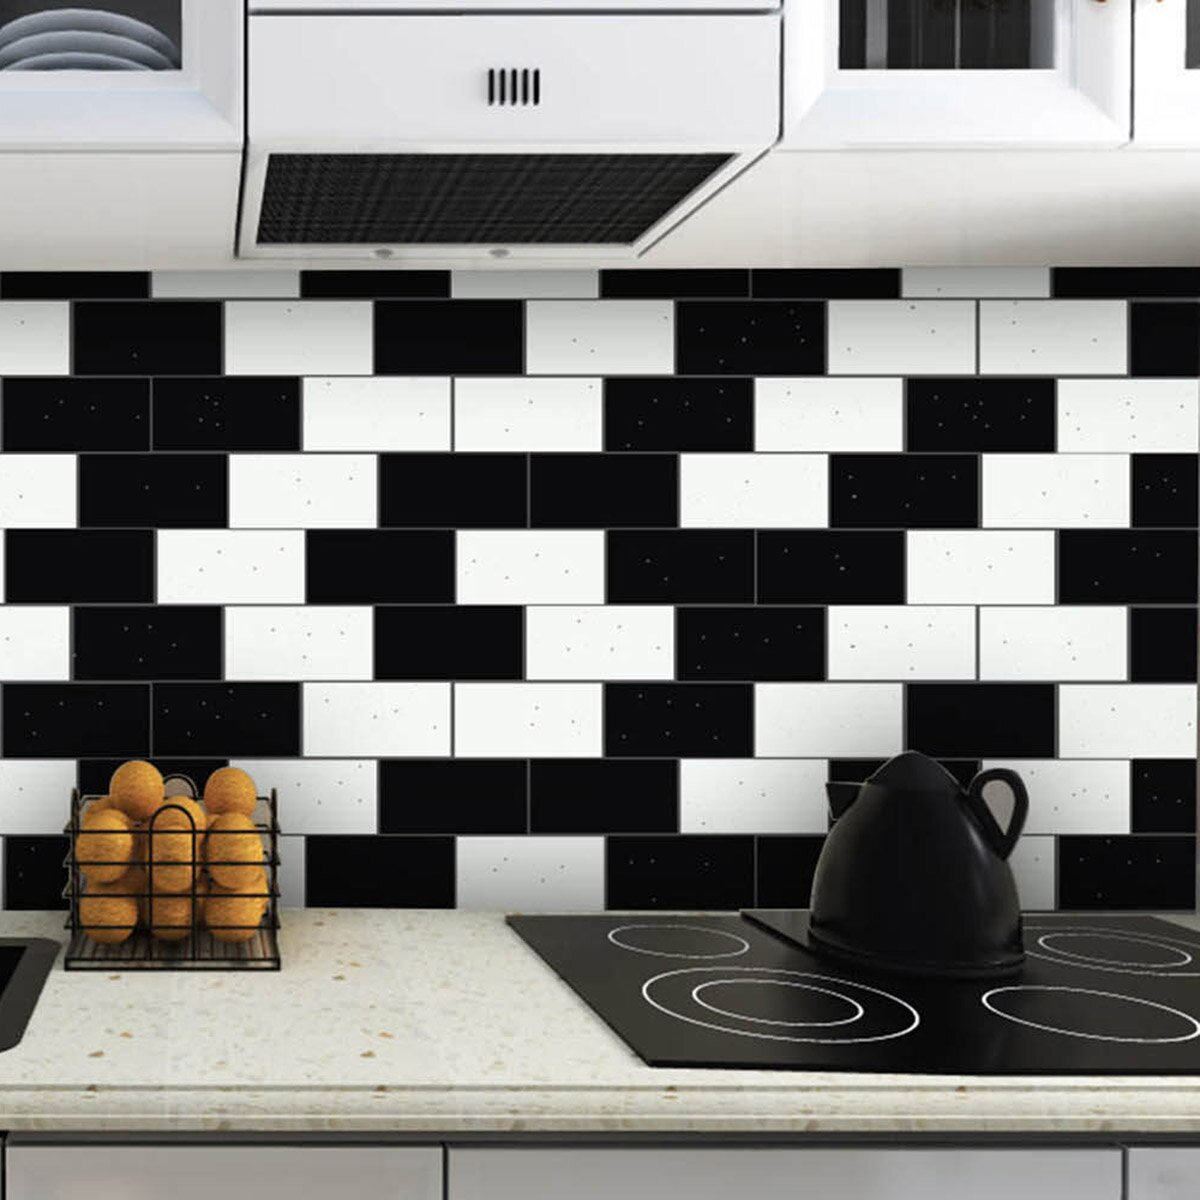 skinnytile 6 x 3 glass peel and stick subway tile in black. Black Bedroom Furniture Sets. Home Design Ideas